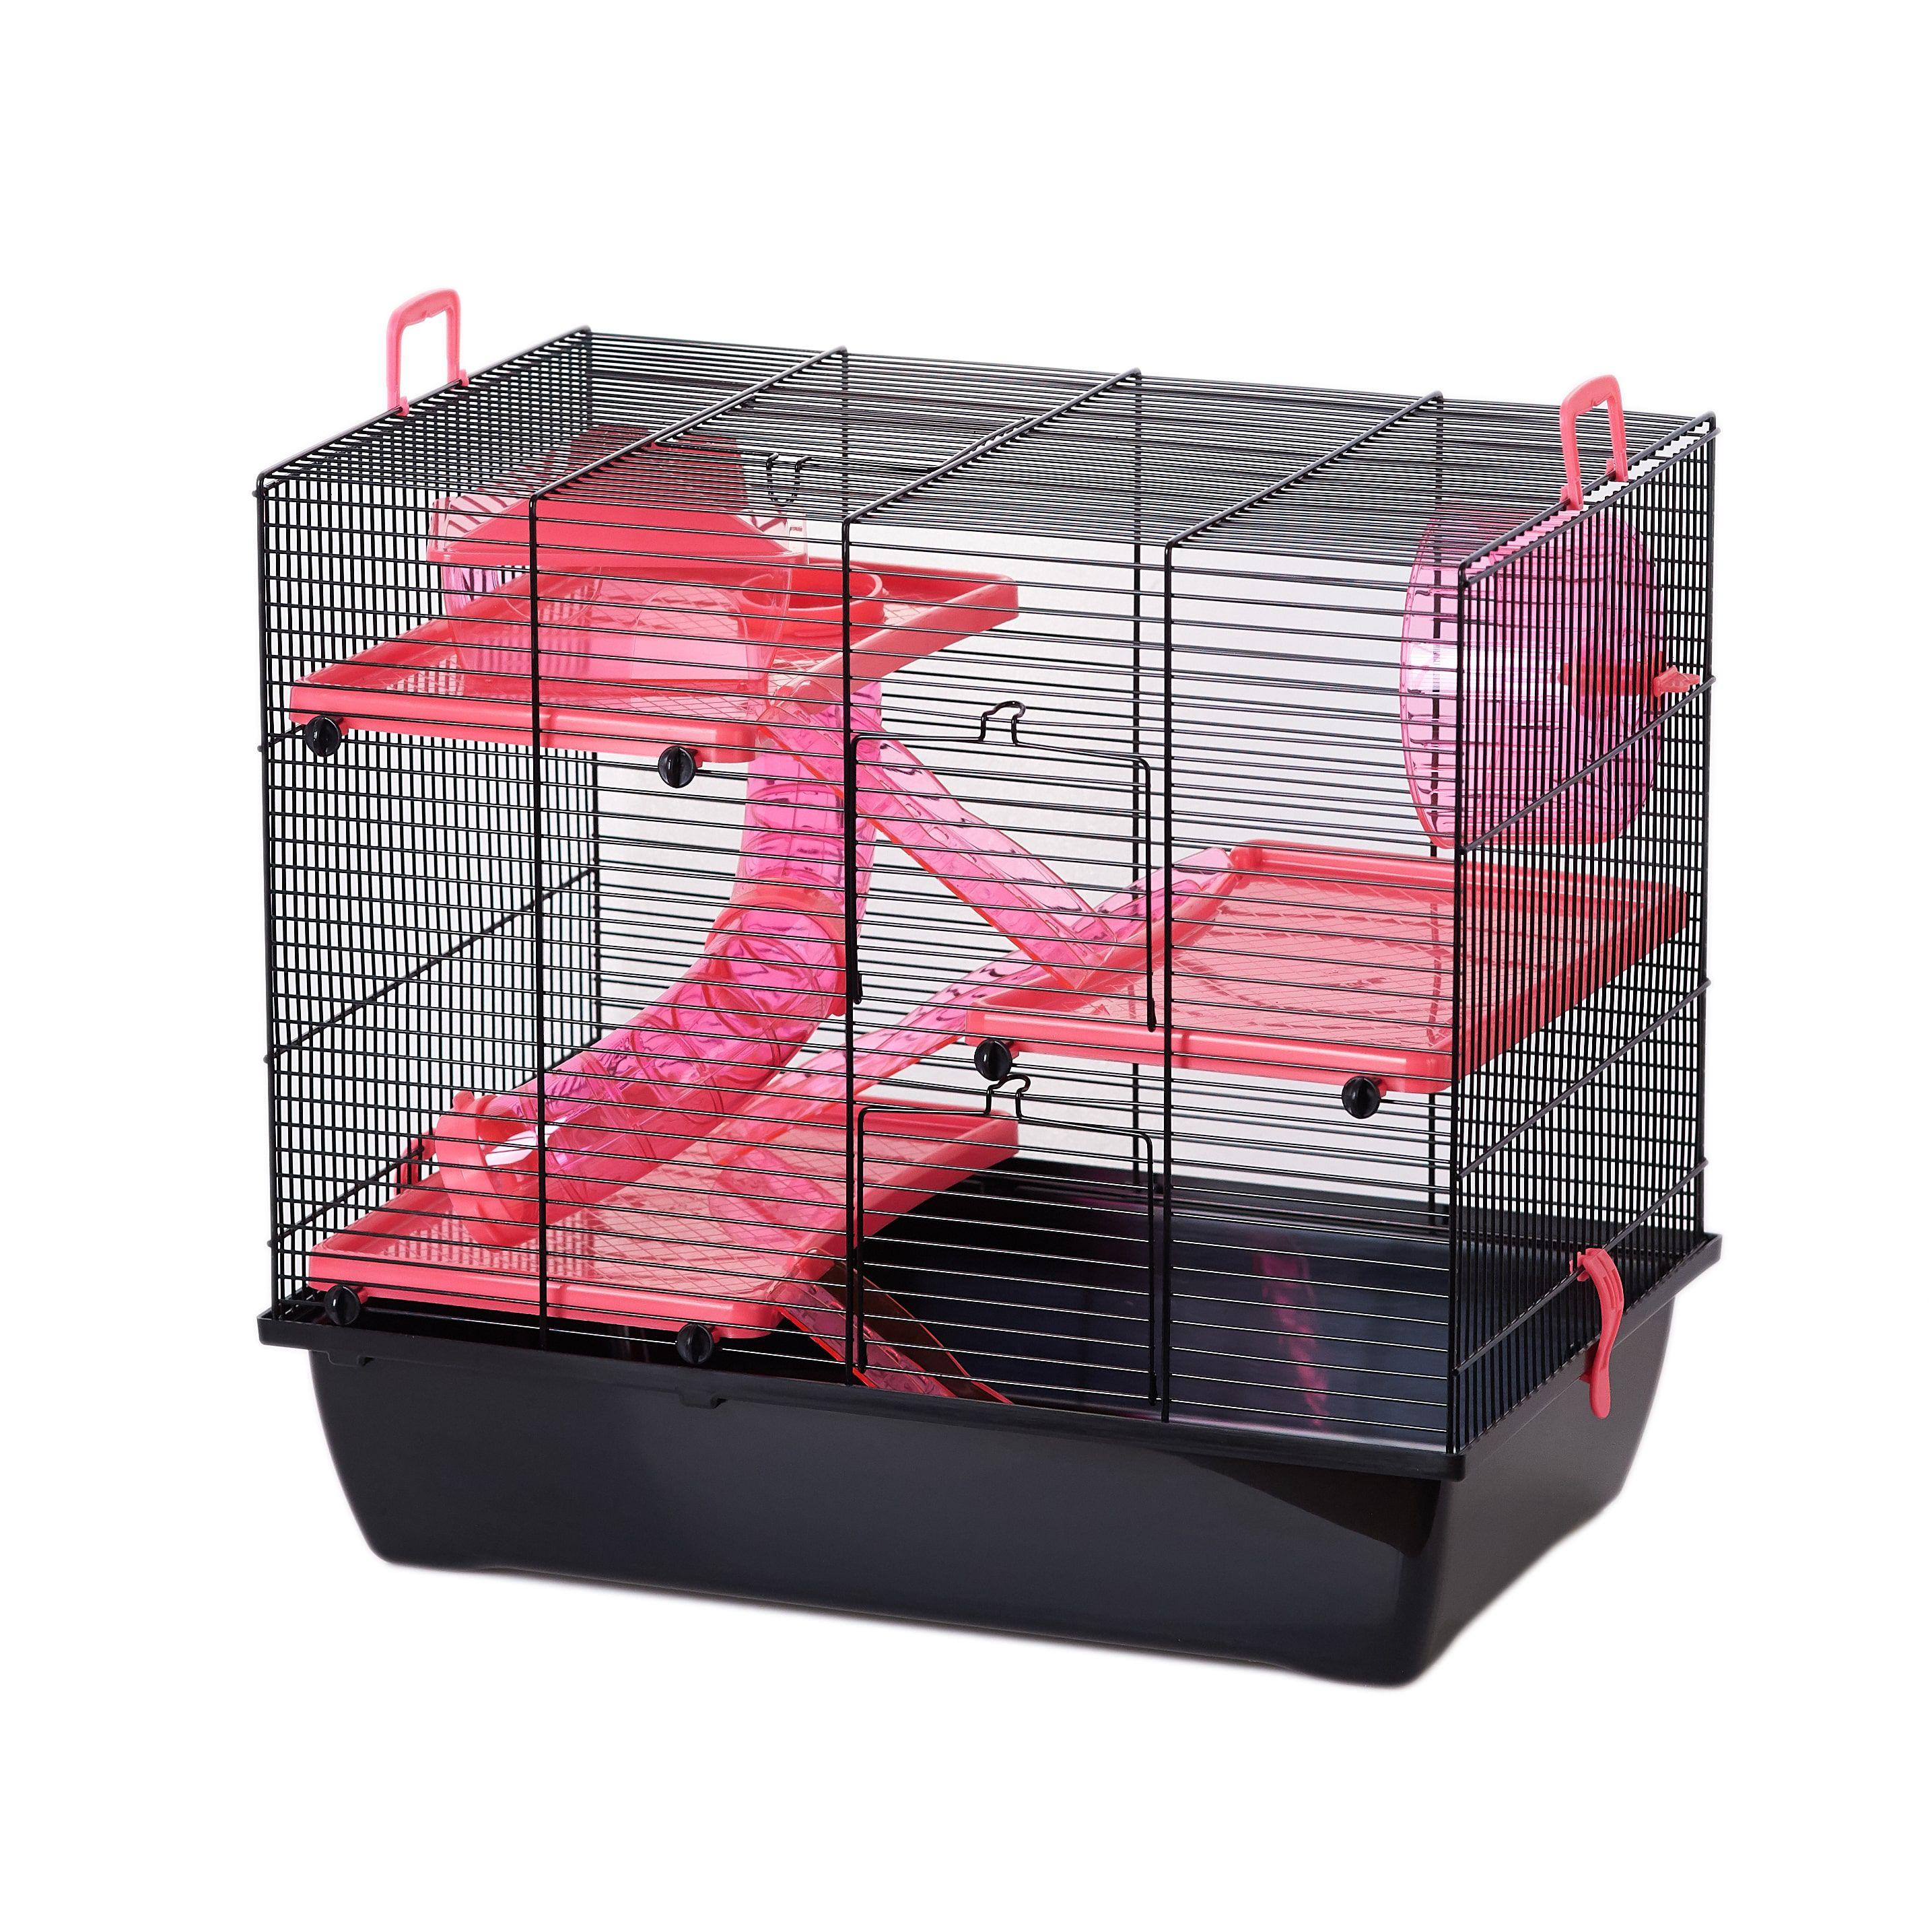 Hamsterkooi Delin Flamingo - Roze/Zwart - 50 x 33 x 45.5 cm